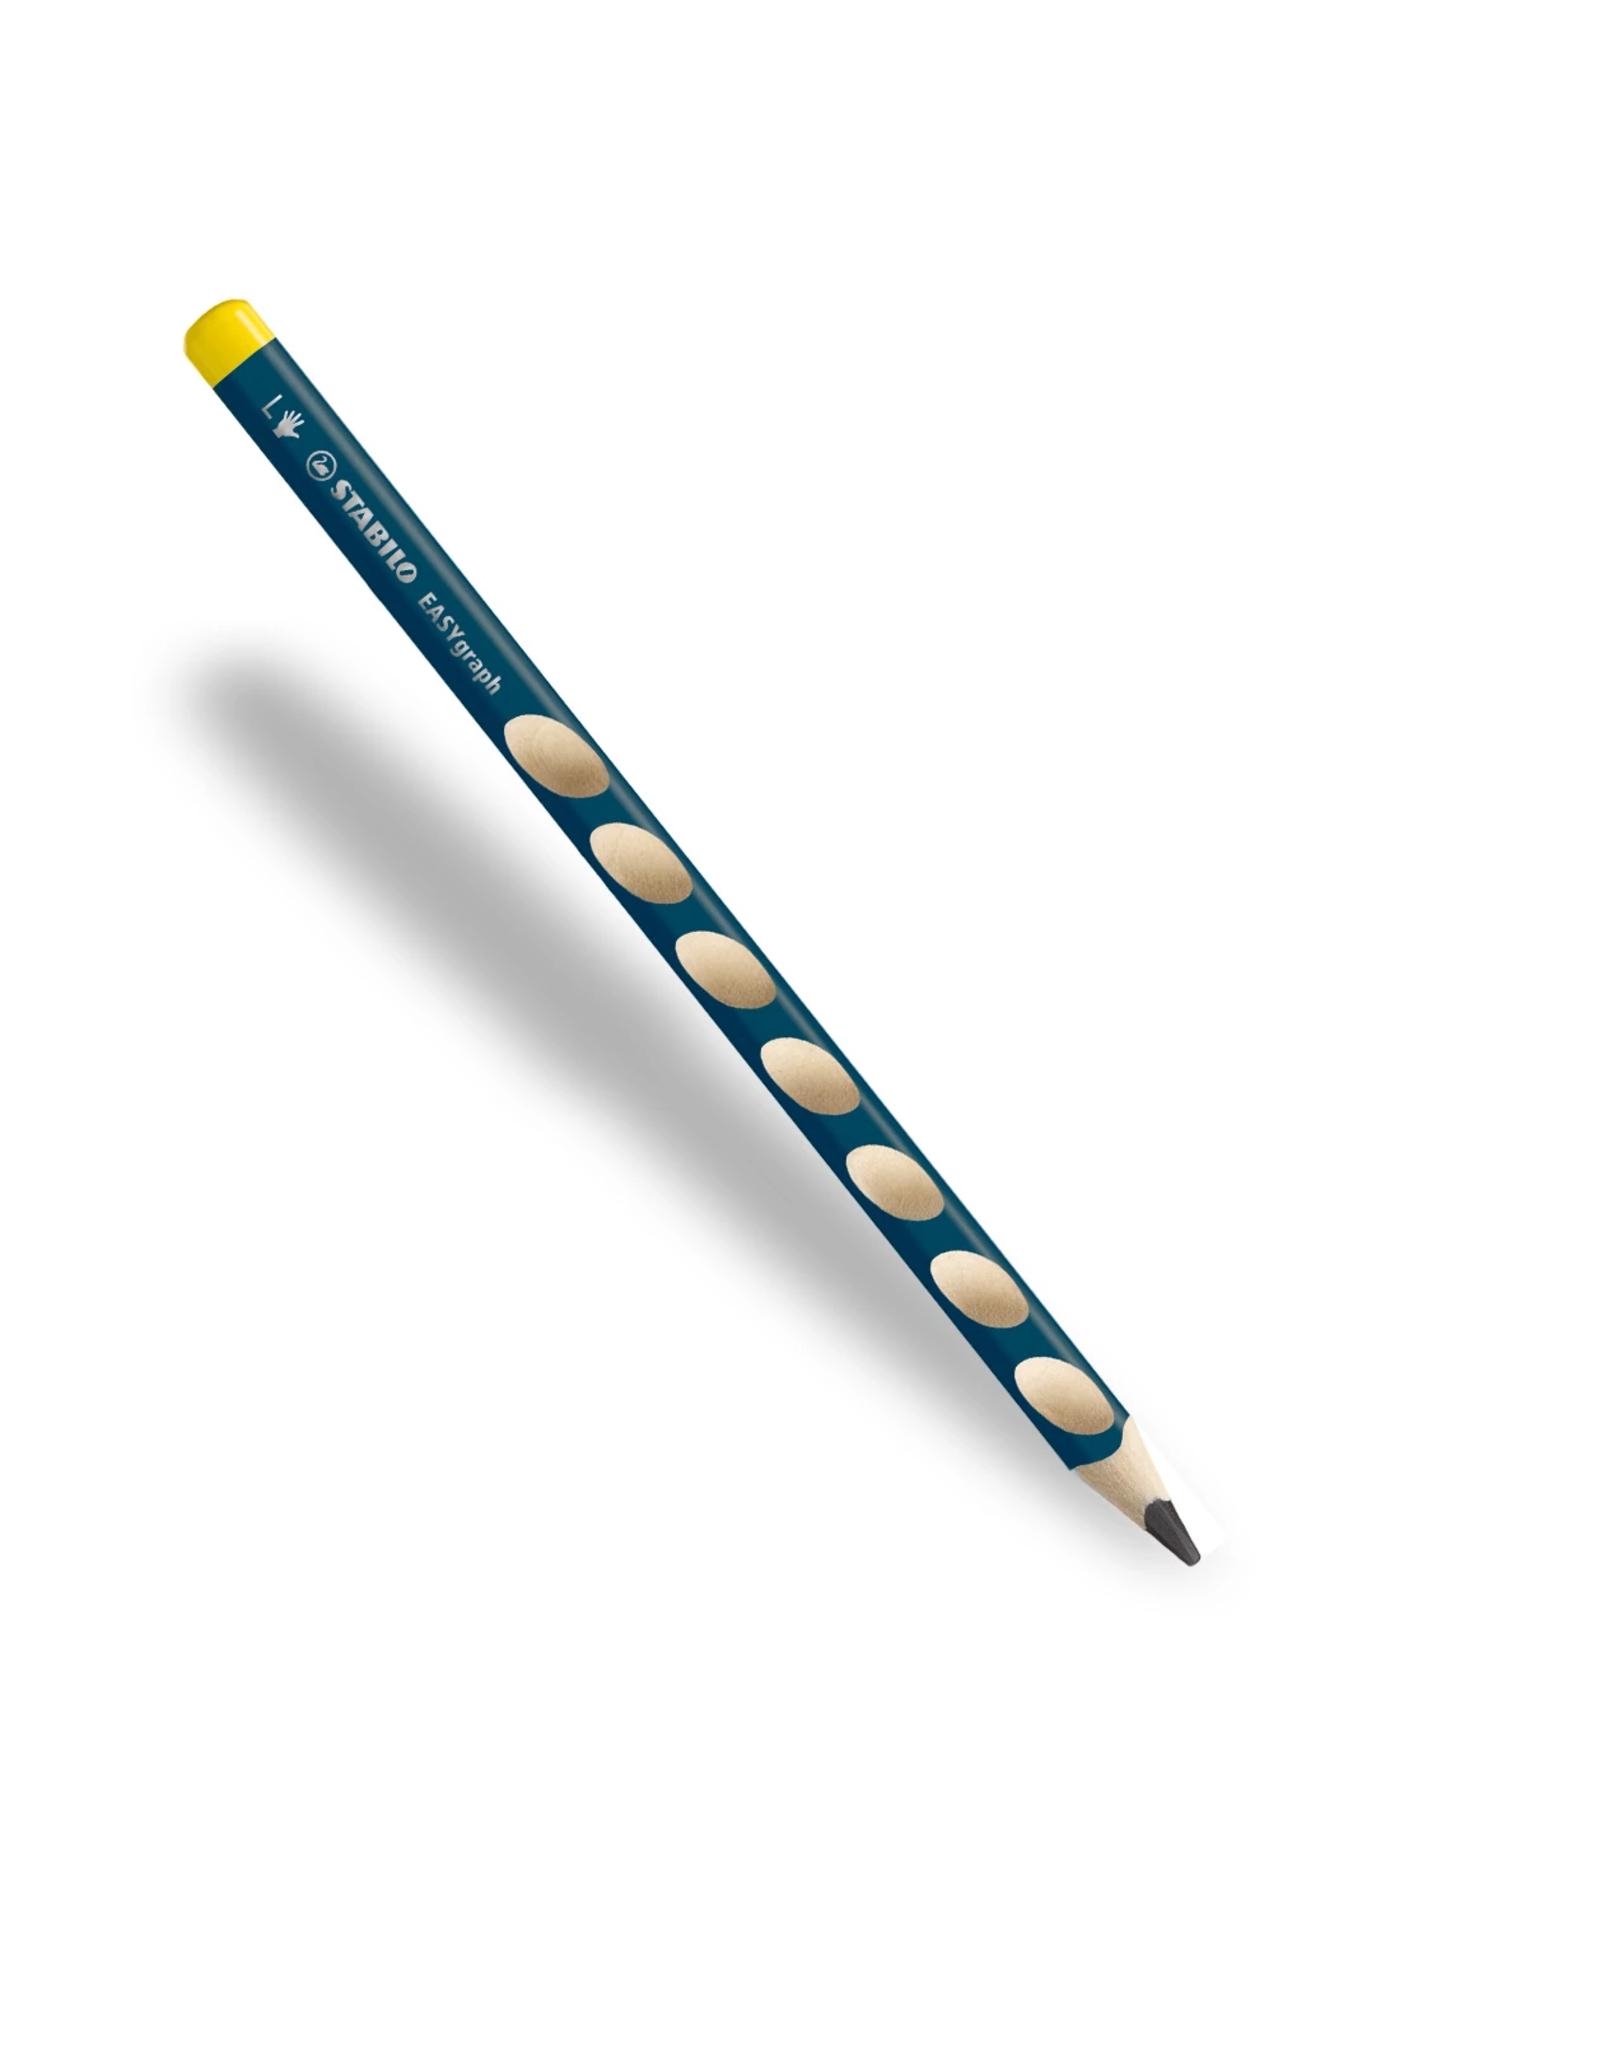 Stabilo Stabilo Easygraph Slim Left Petrol Pencil (325/HB-6)